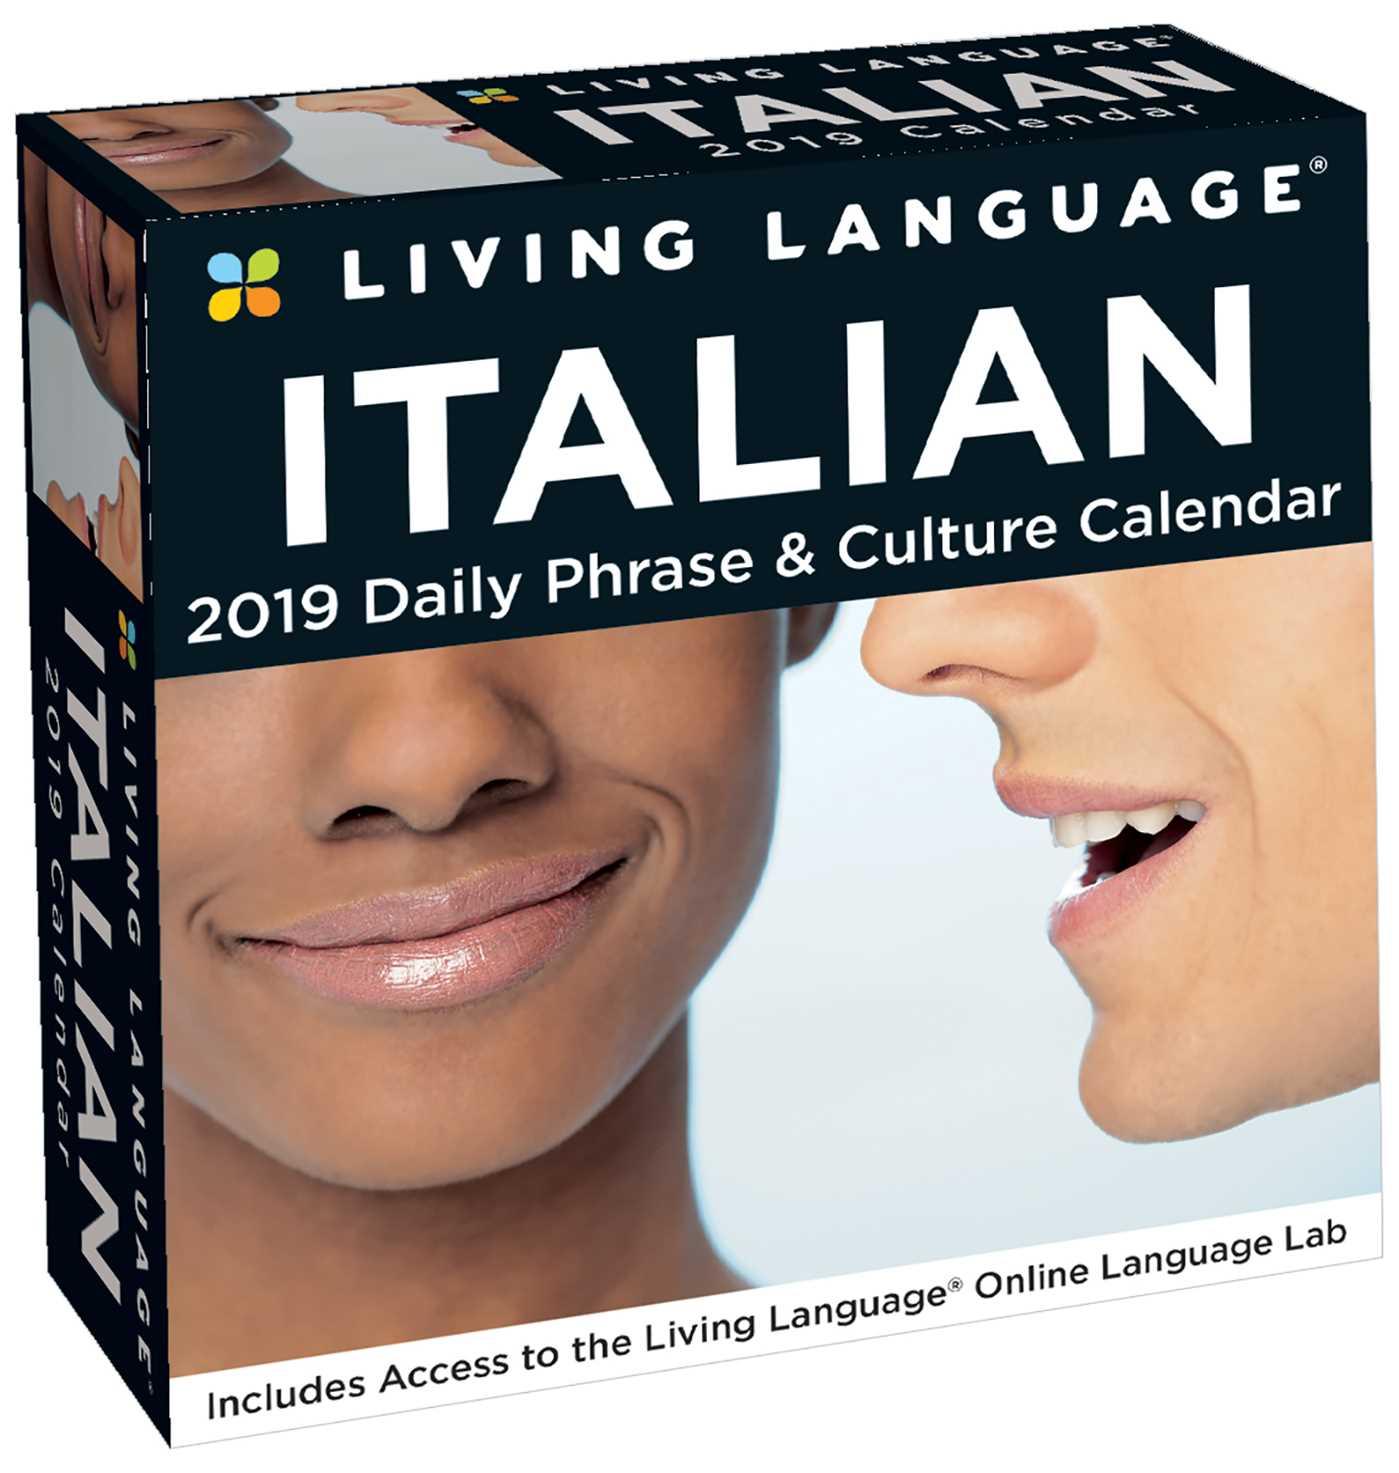 Living Language: Italian 2019 Day-to-Day Calendar